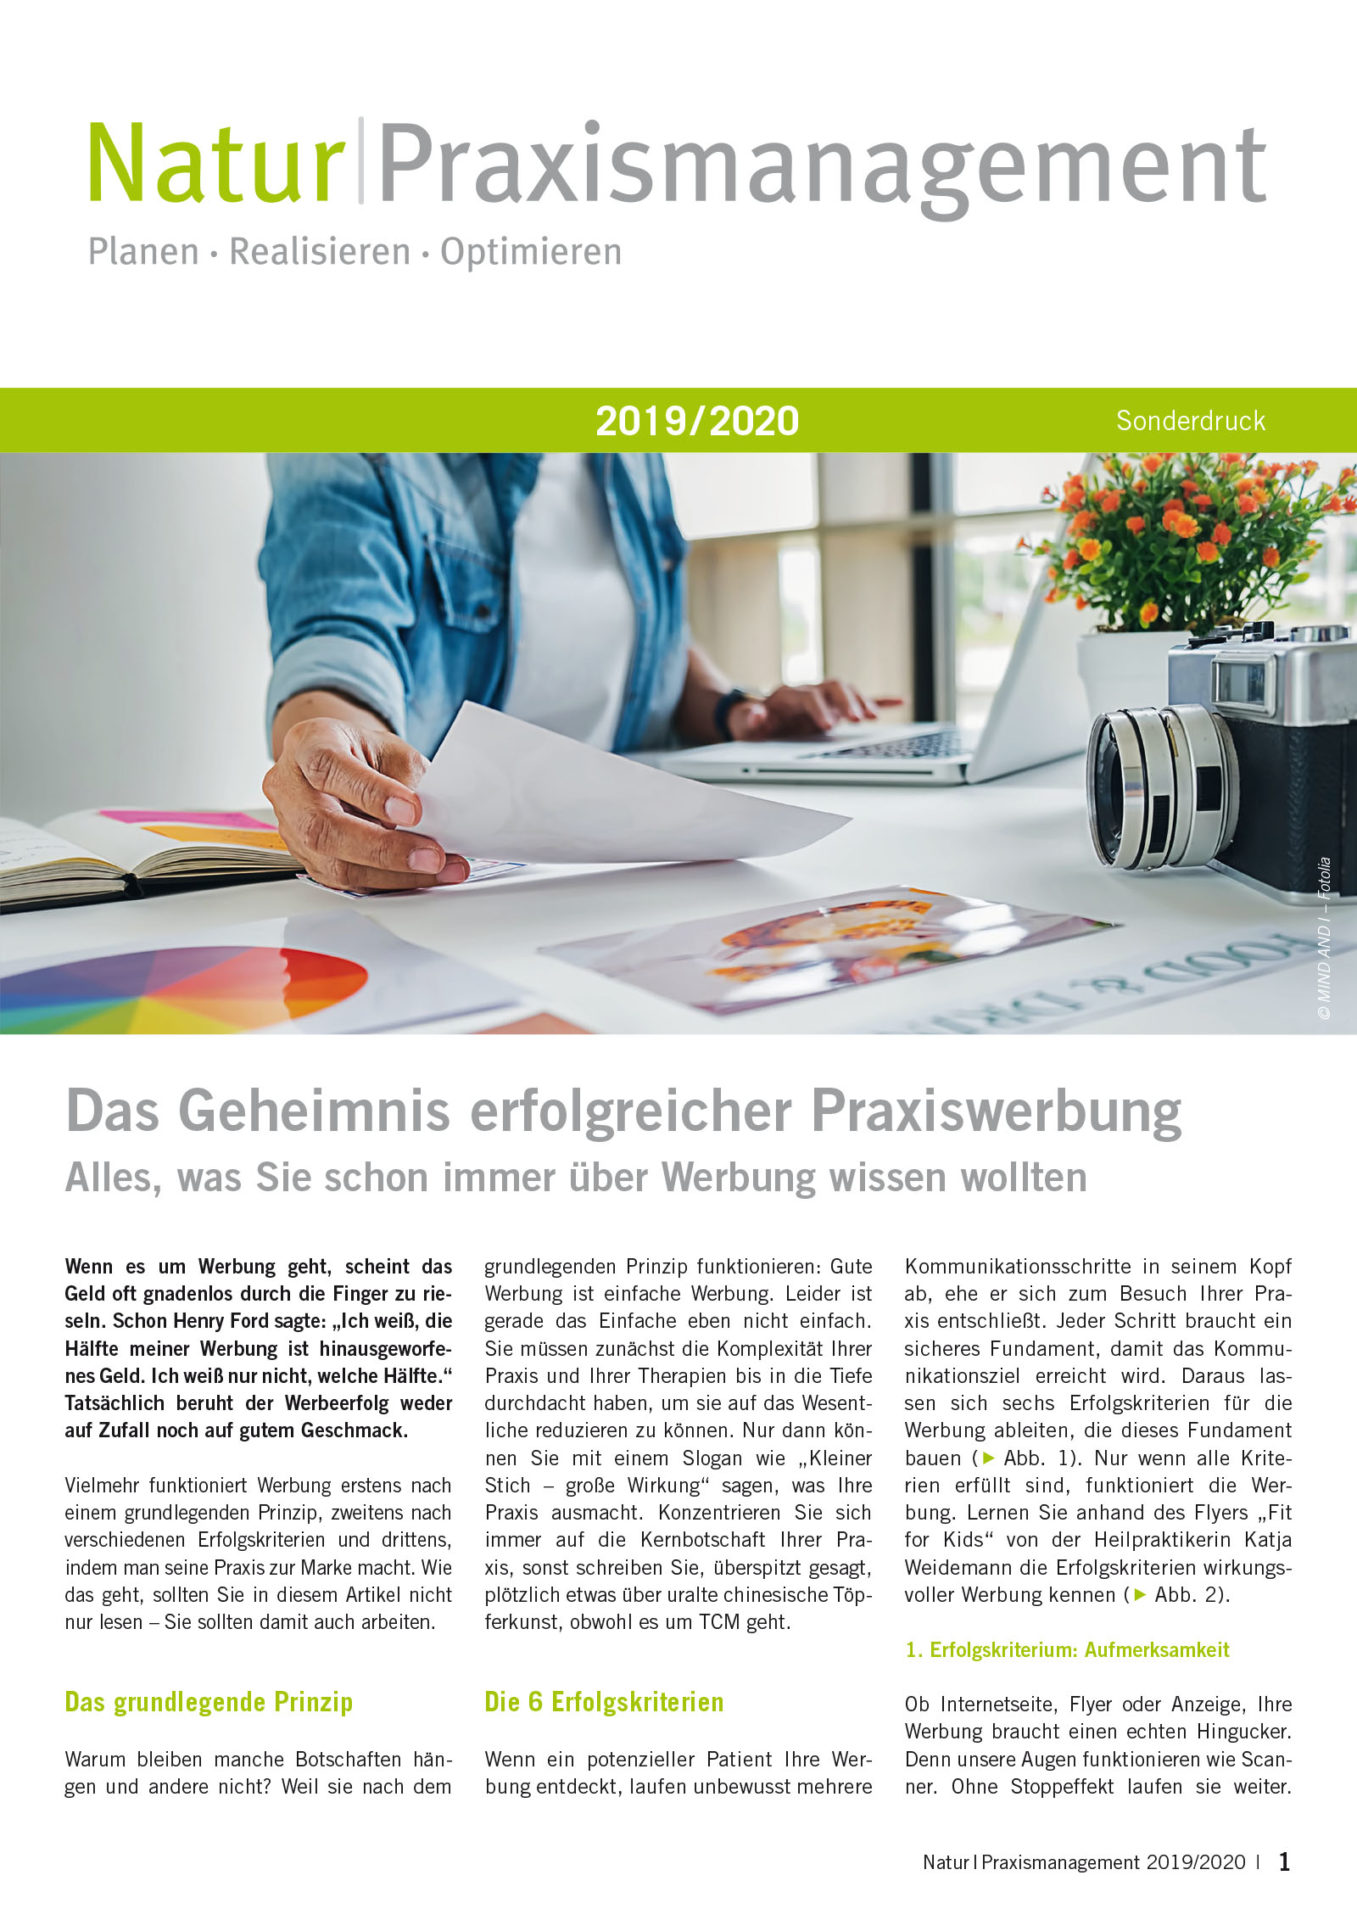 Natur Praxismanagement Artikel CoMed 2019/2020; Heidrun Peschen und Sabine Schmidt-Malaj